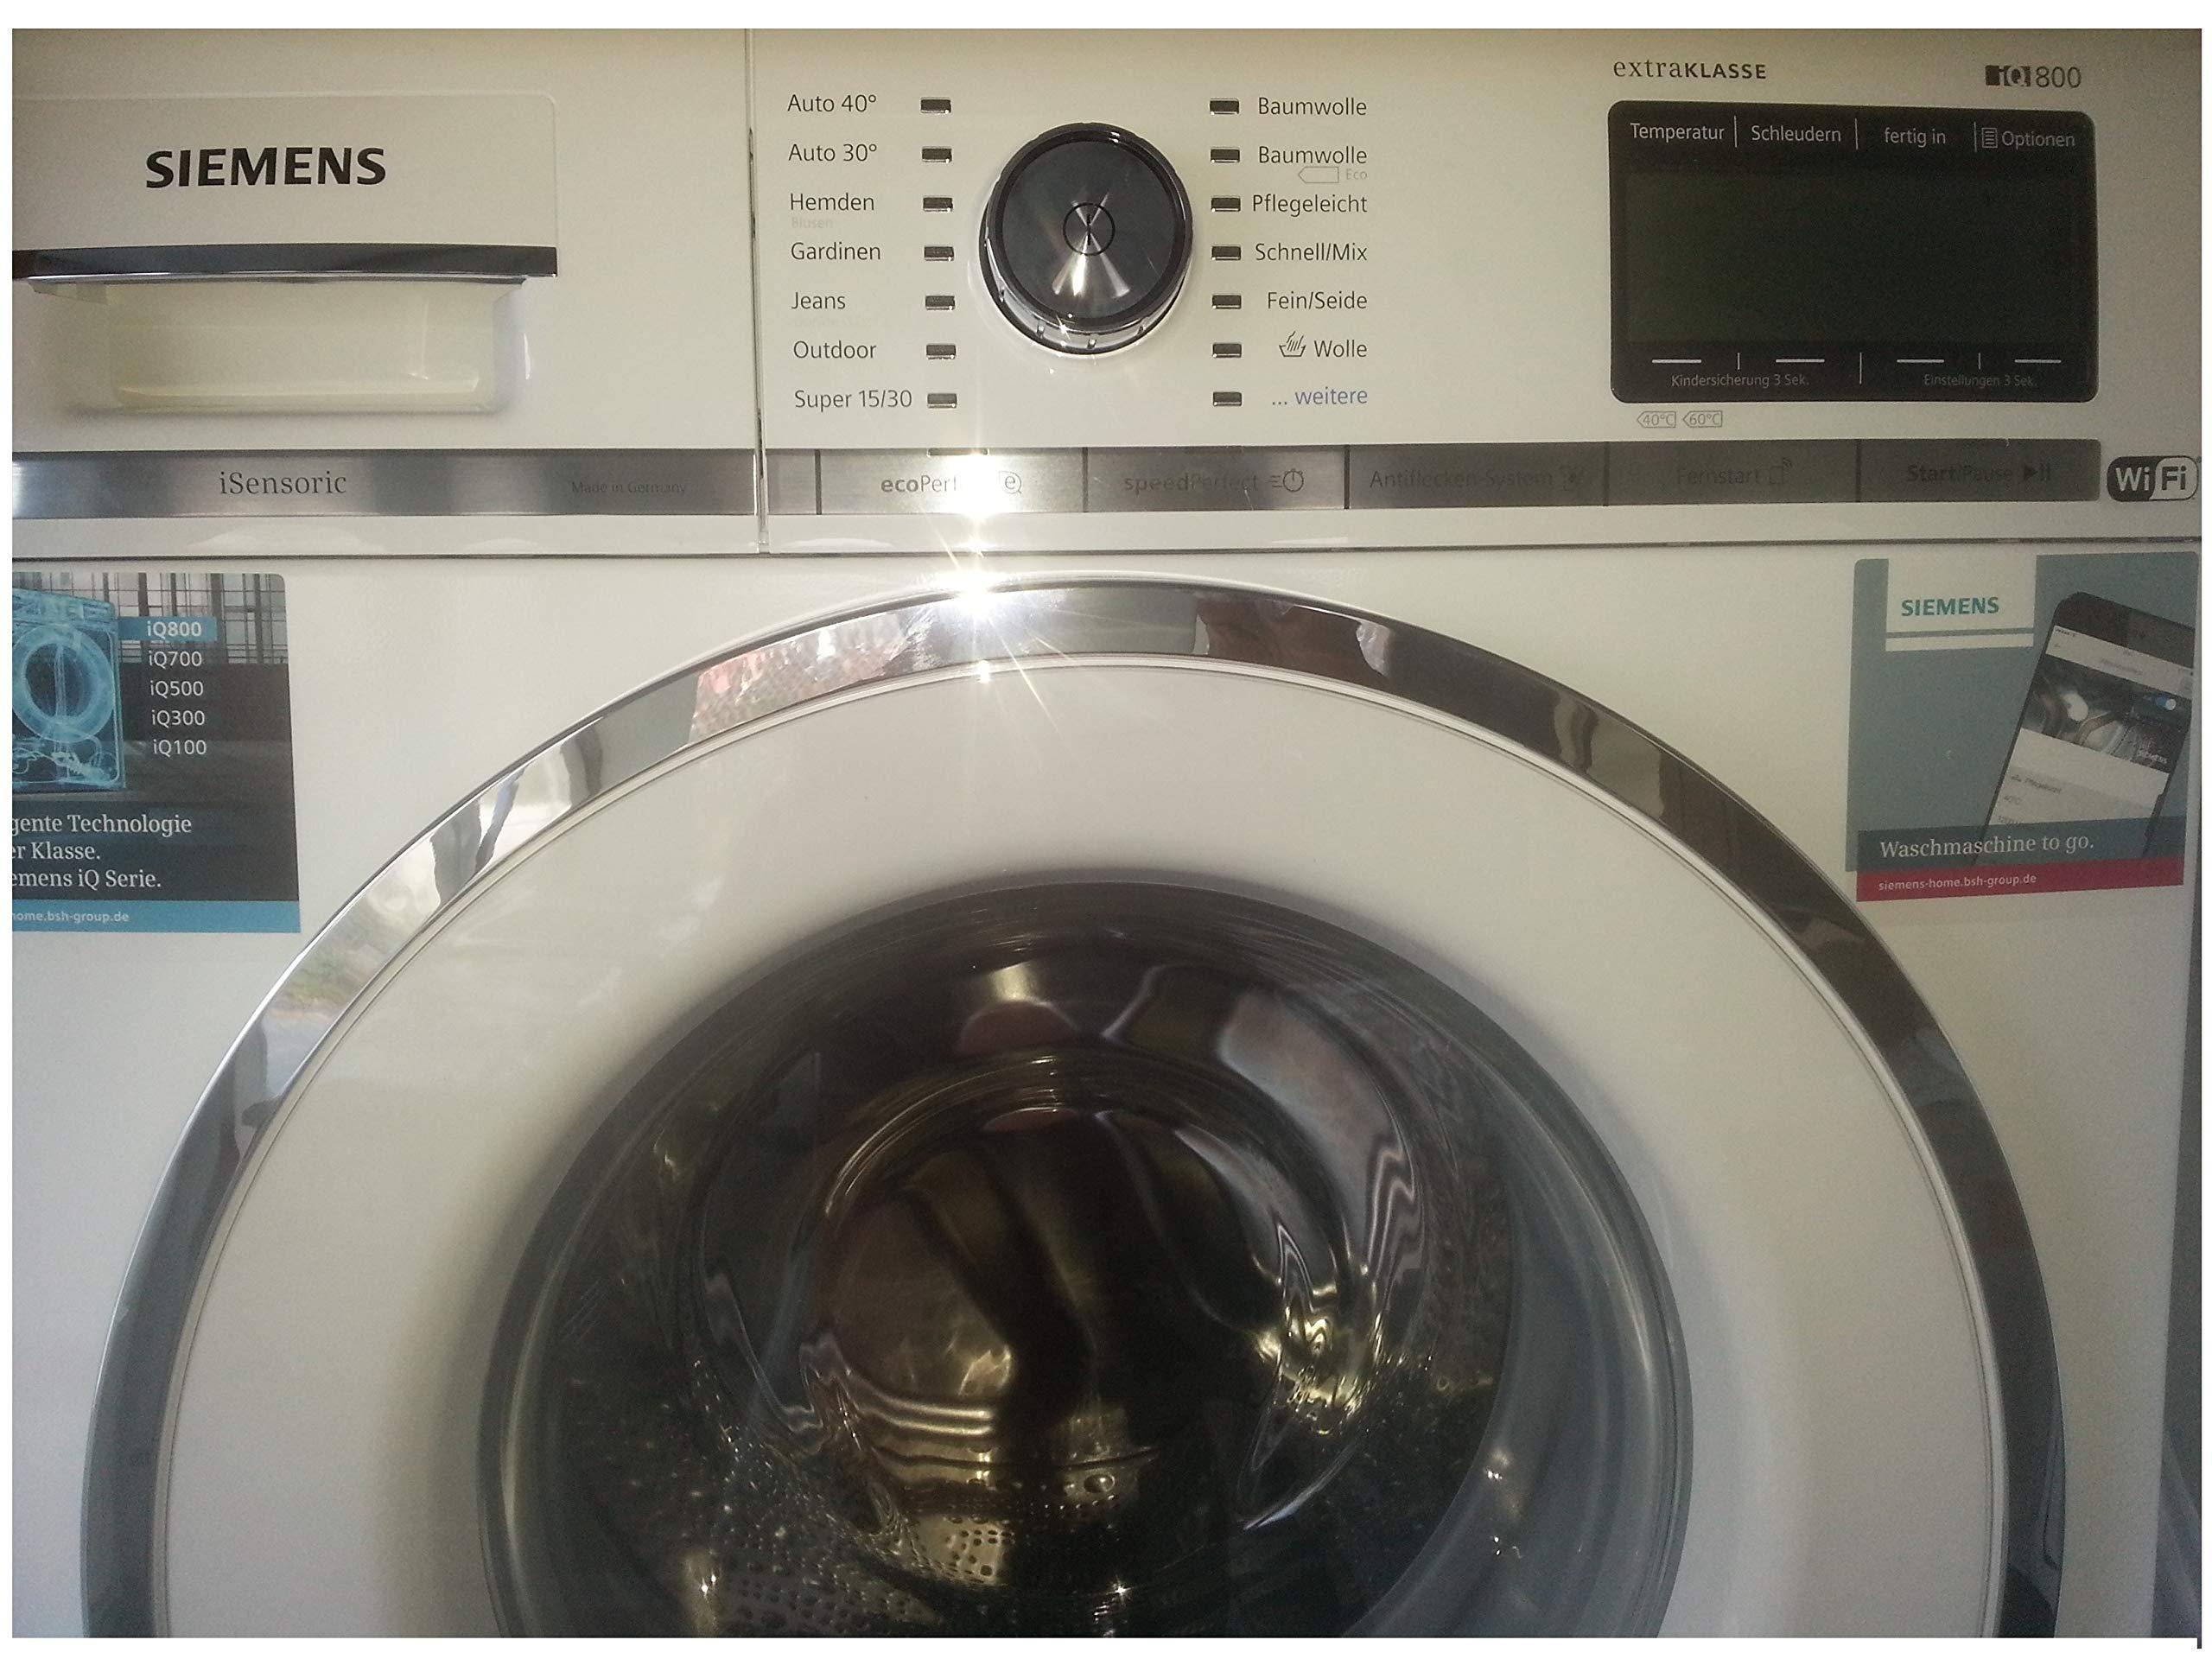 Siemens-iQ800-wm6yh791-autonome-Belastung-Bevor-9-kg-1600trmin-A-Wei-Waschmaschine–Waschmaschinen-autonome-bevor-Belastung-wei-links-TFT-180-